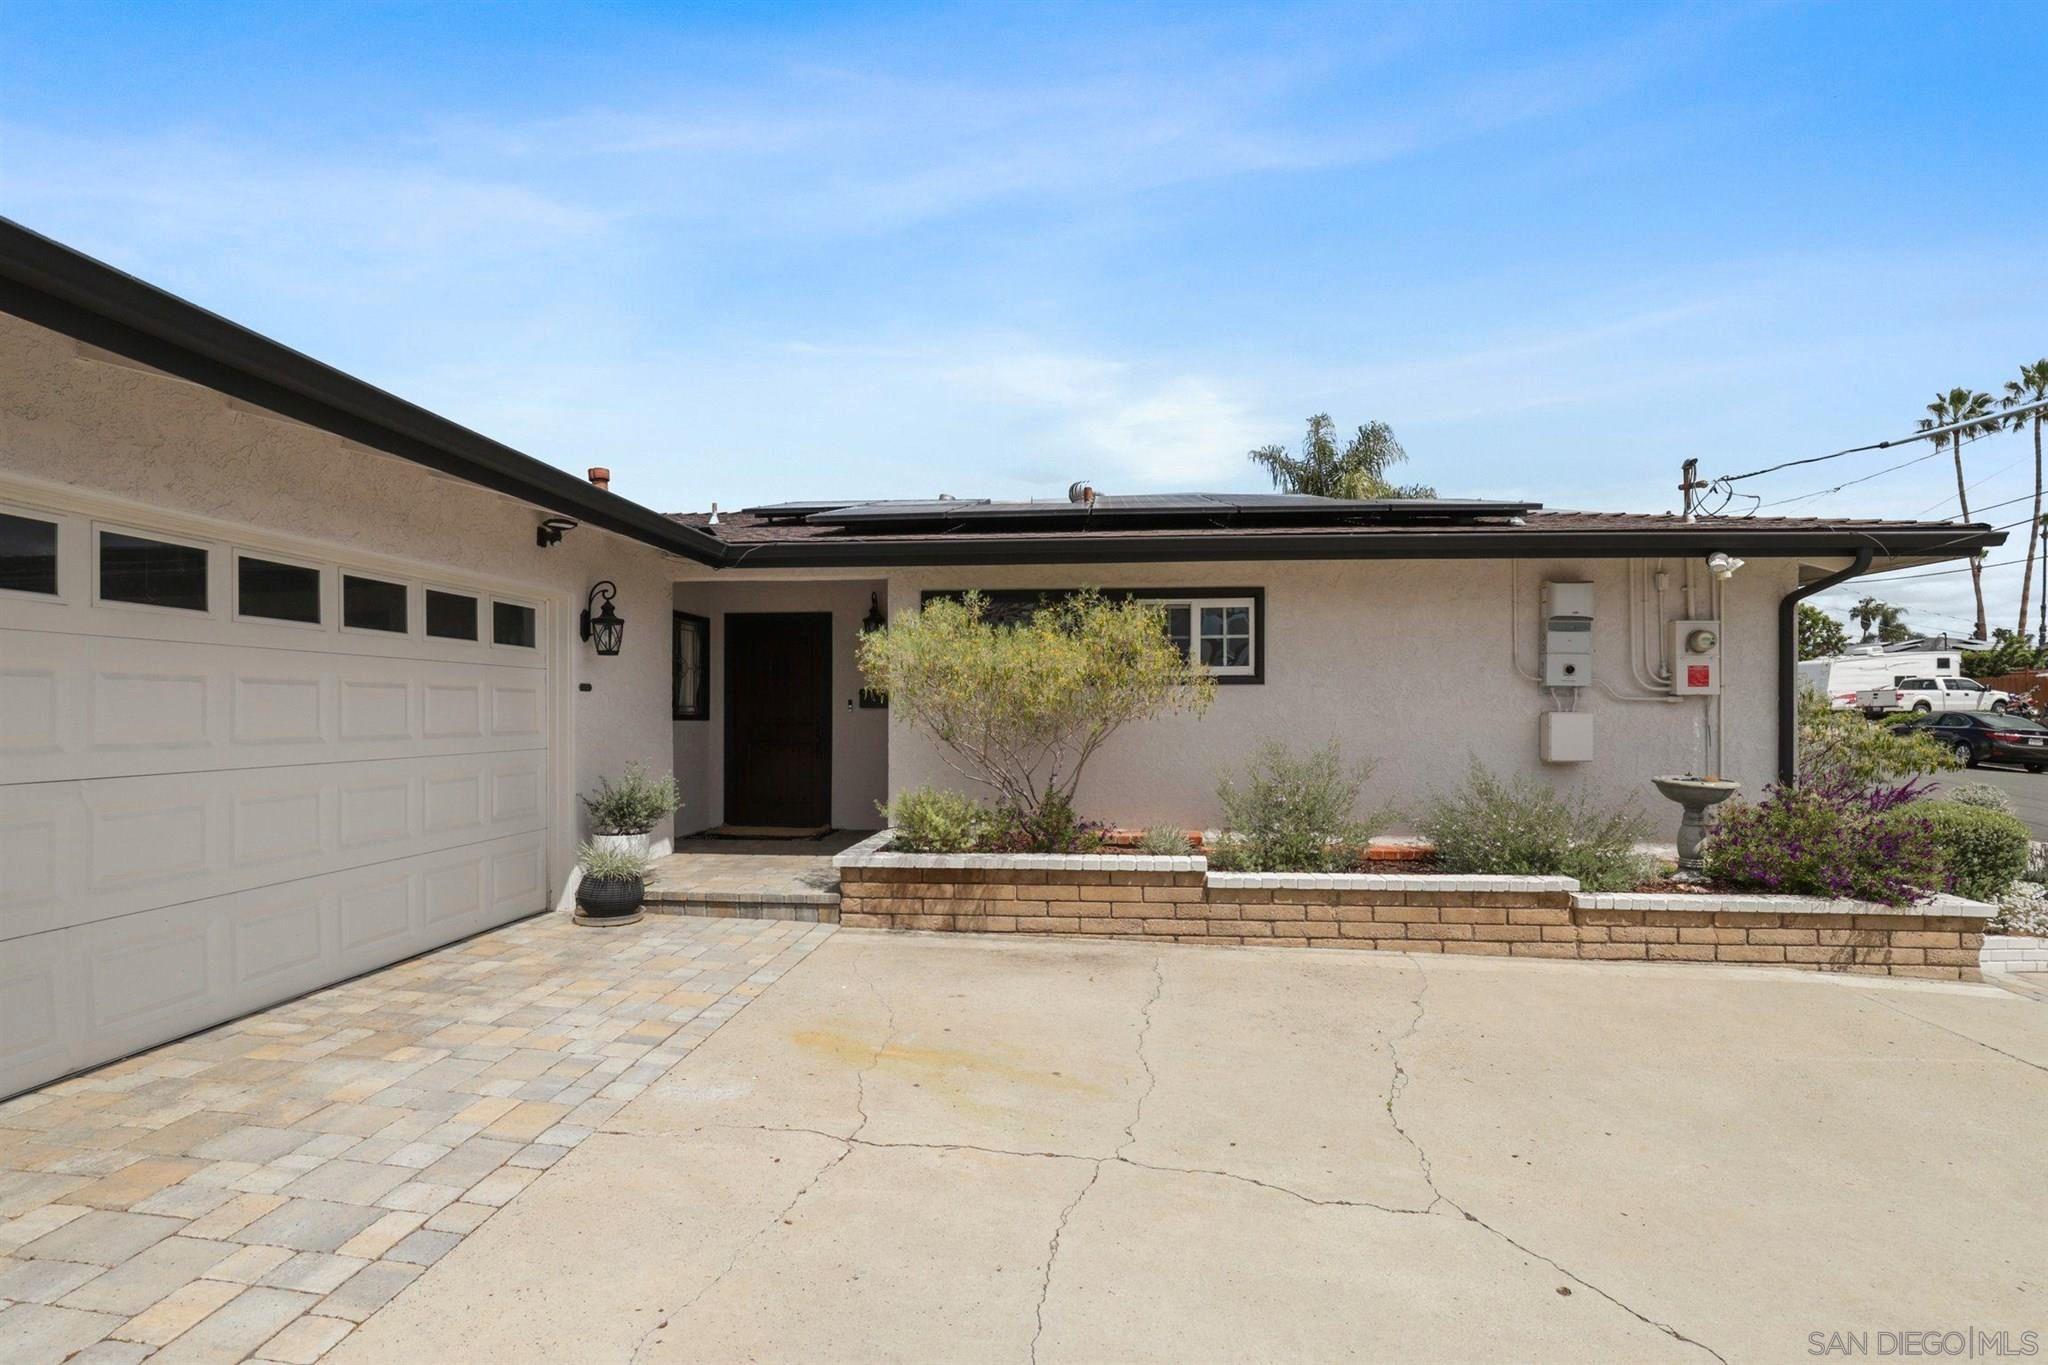 Main Photo: LA MESA House for sale : 3 bedrooms : 5806 Kappa St